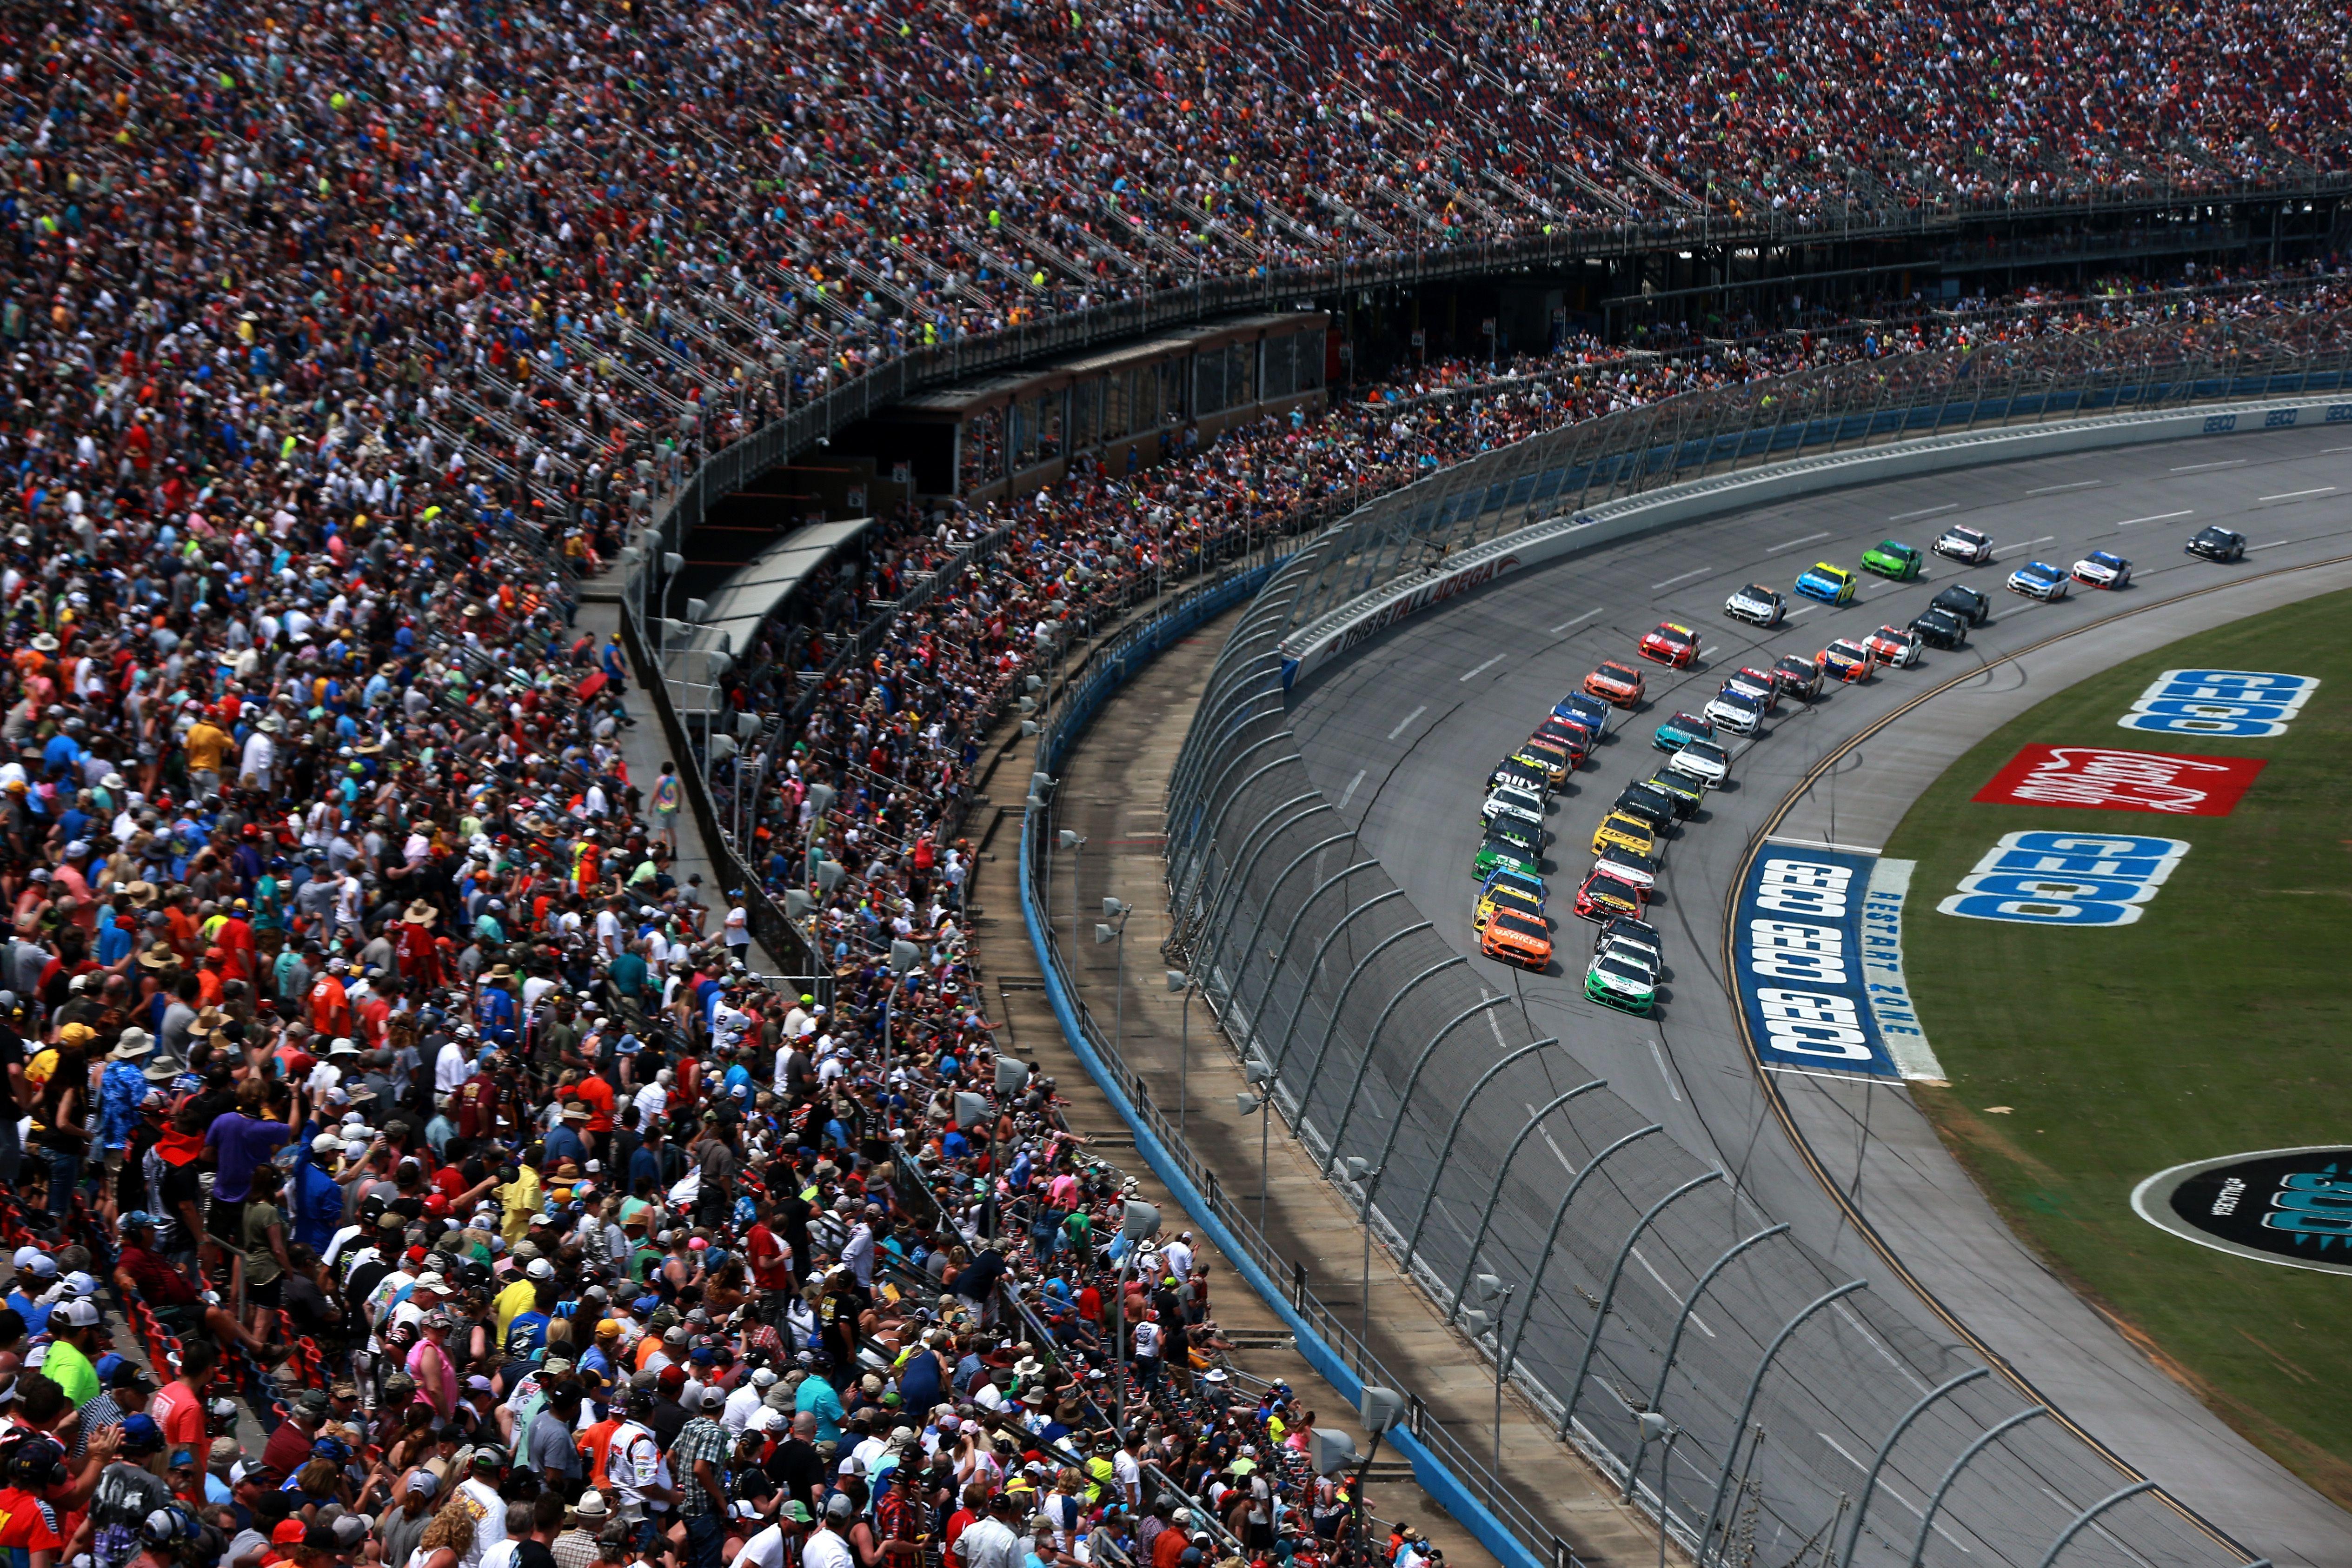 Talladega racetrack